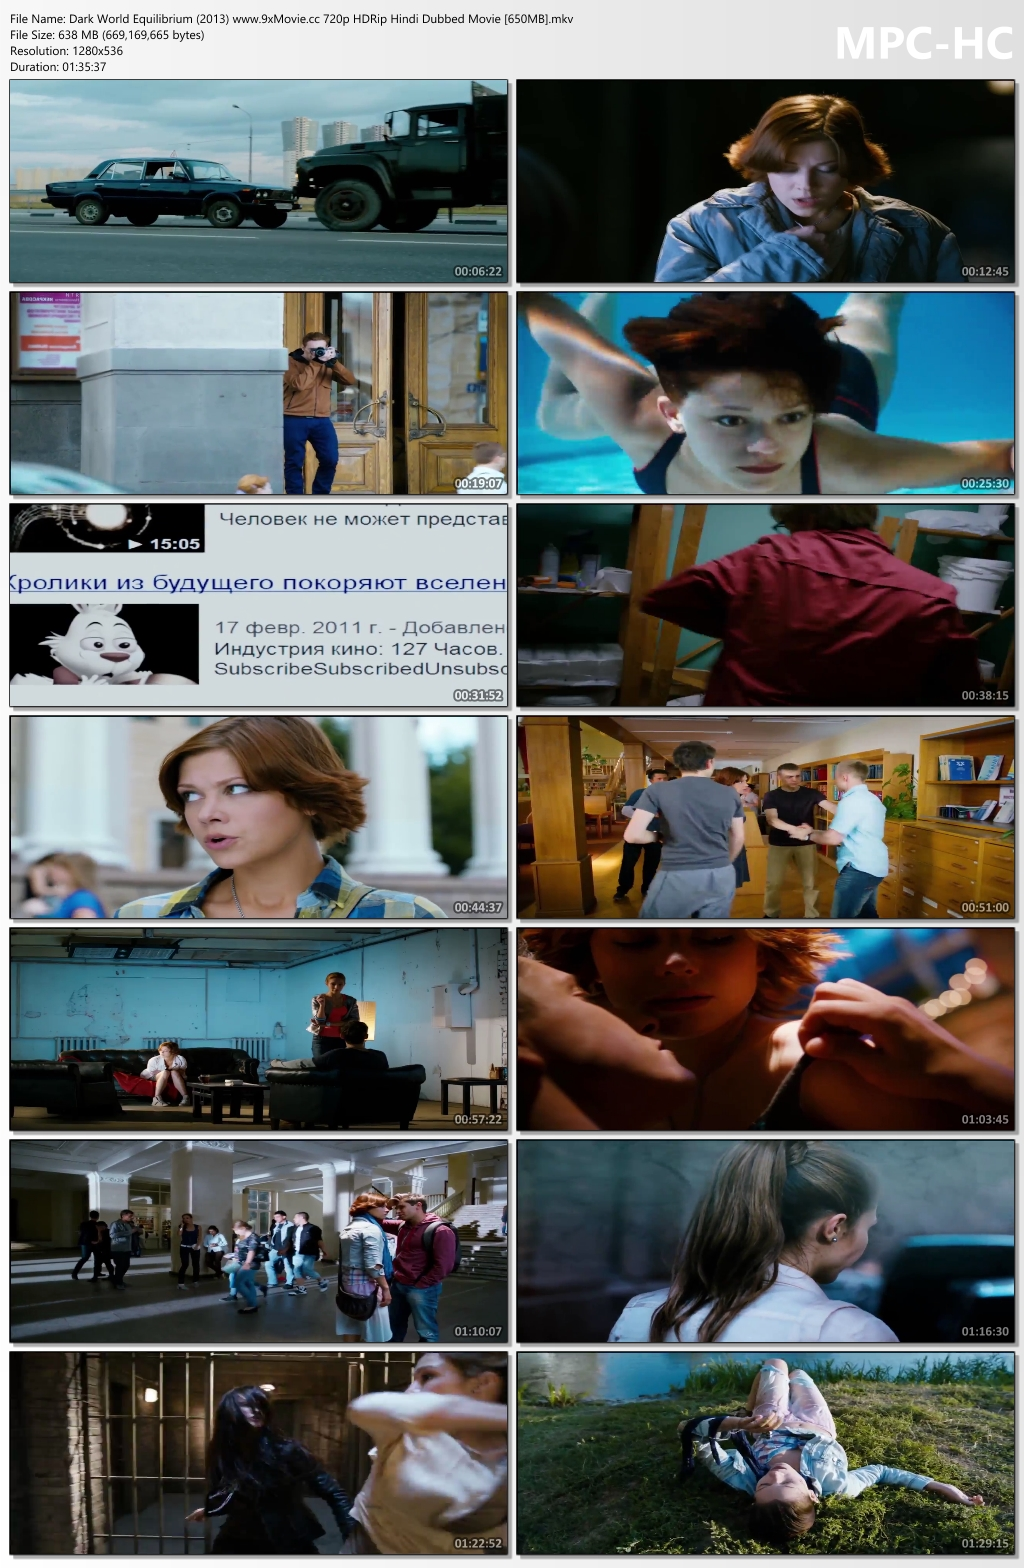 Dark-World-Equilibrium-2013-www-9x-Movie-cc-720p-HDRip-Hindi-Dubbed-Movie-650-MB-mkv